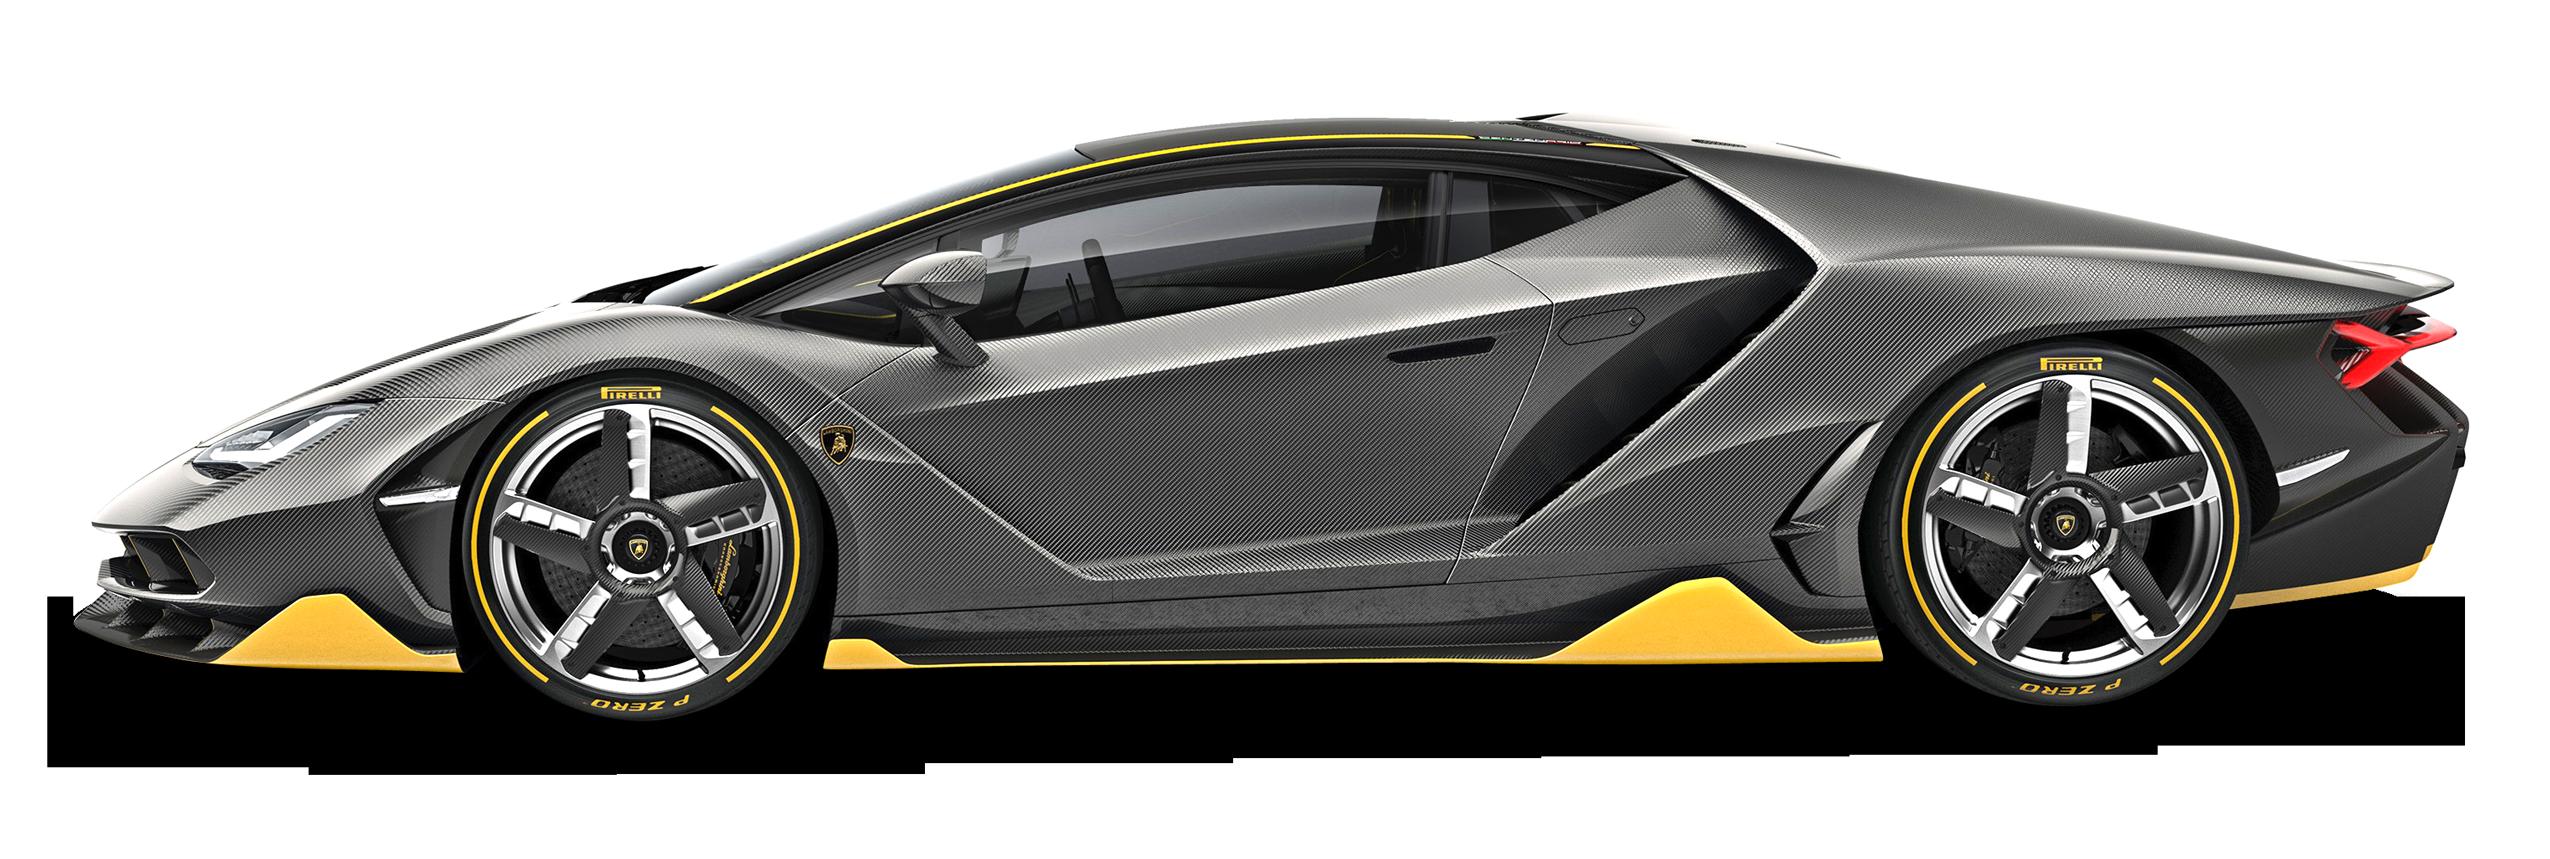 Black Lamborghini Centenario LP 770 4 Car PNG Image